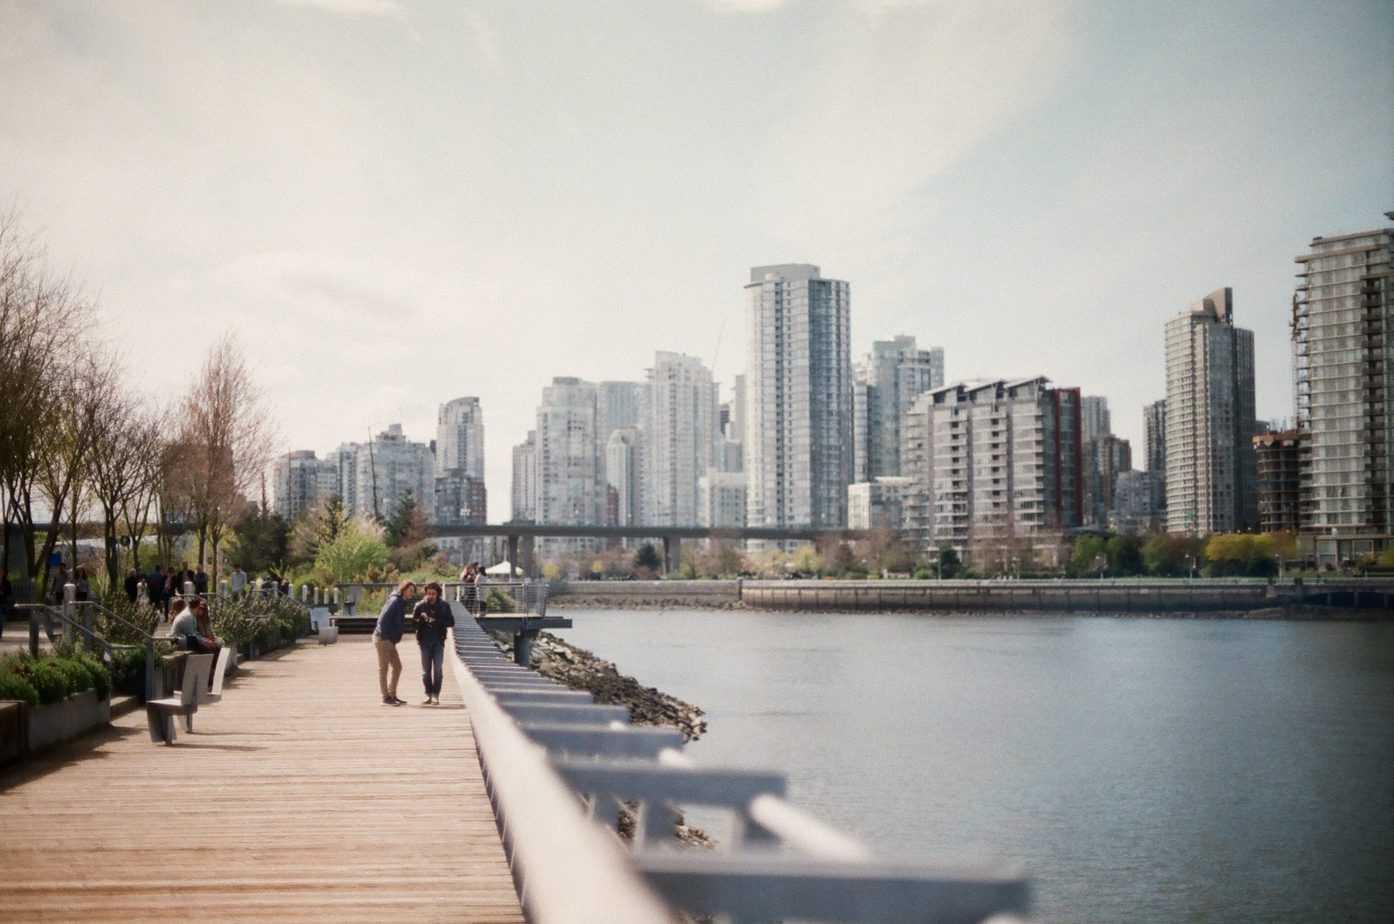 University of British Columbia Canada